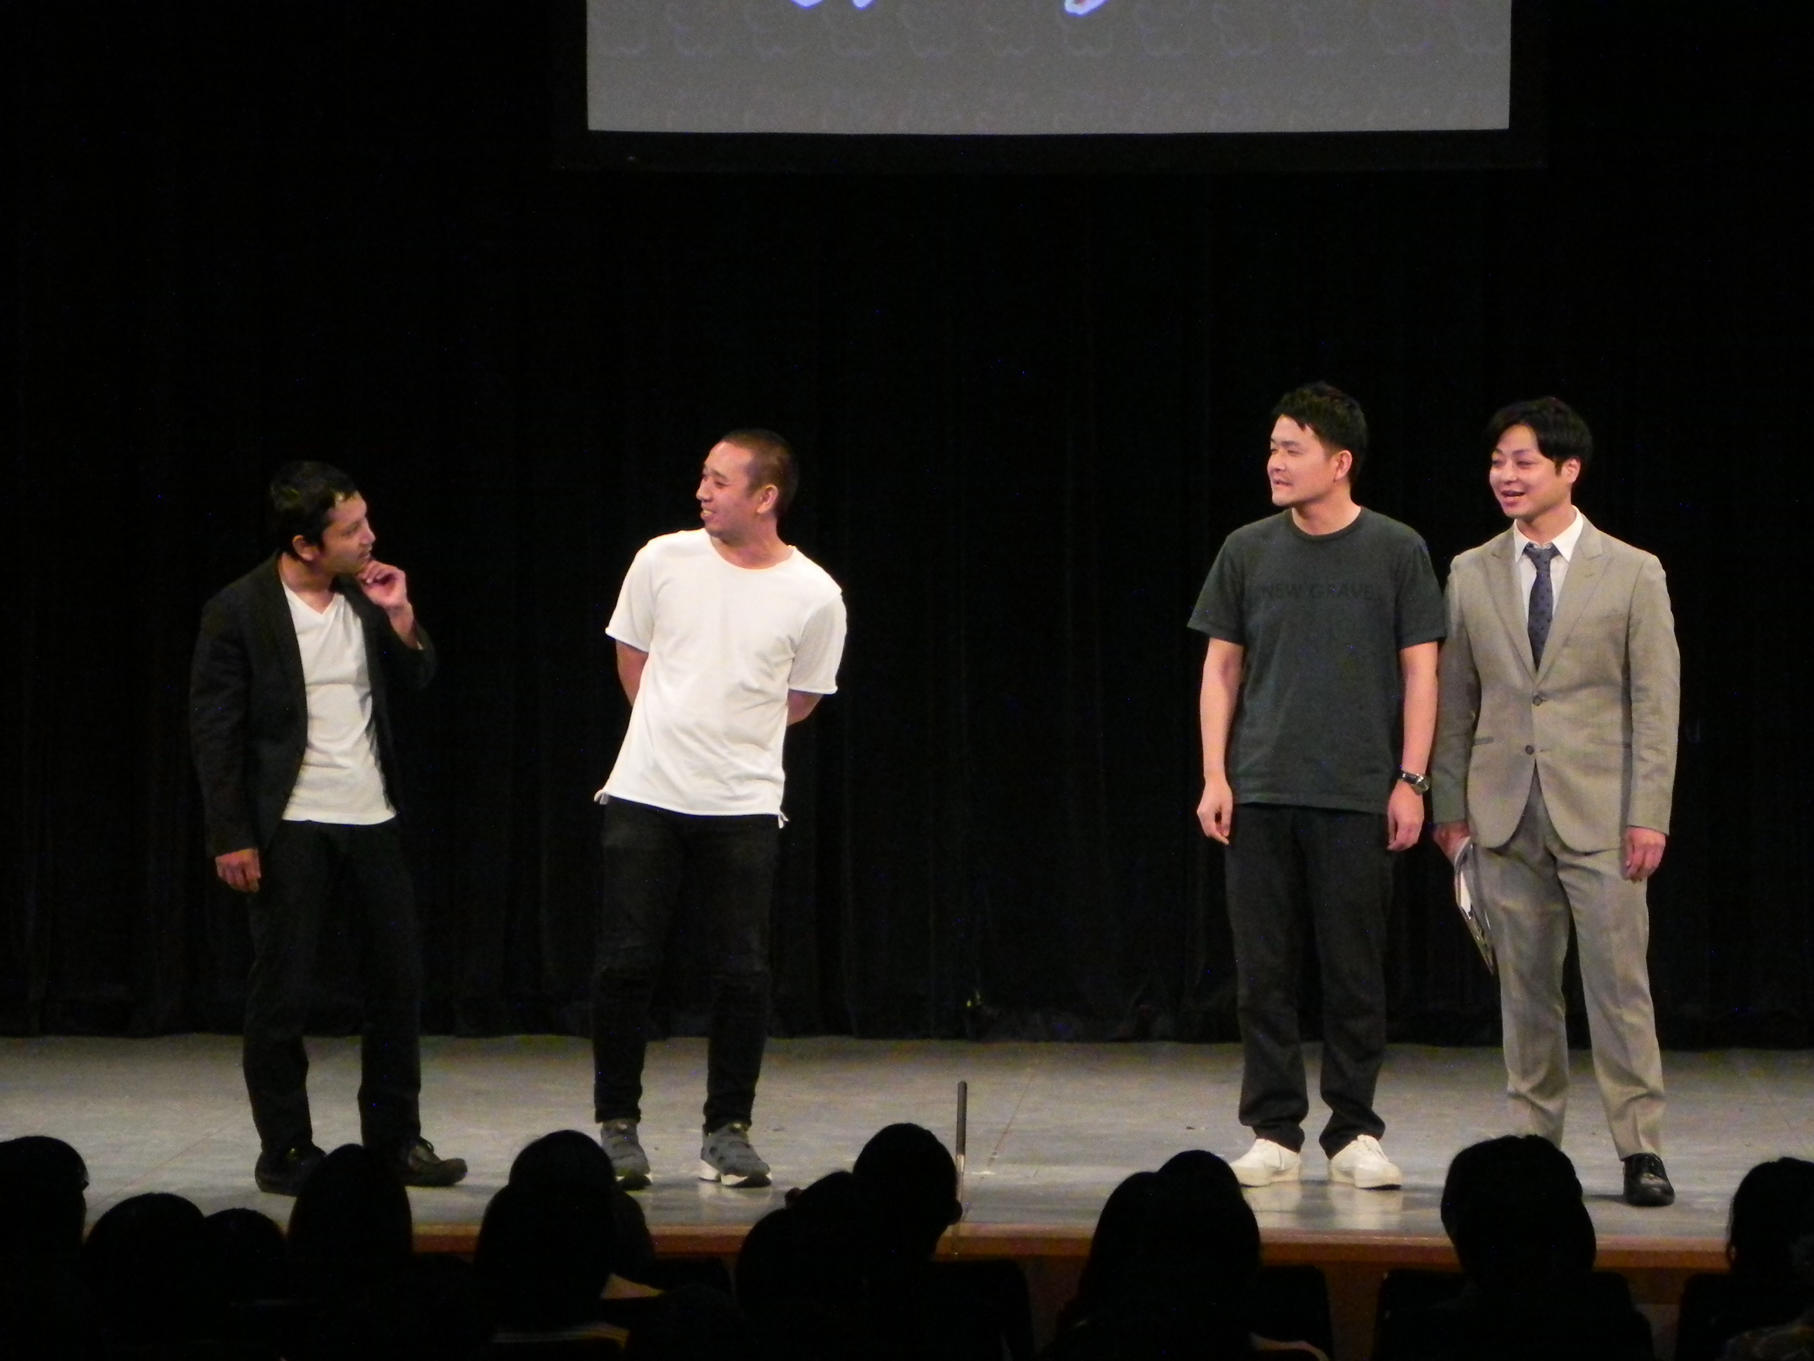 http://news.yoshimoto.co.jp/20170717195639-a205e72fea7ac2ccf95130fa5c025154b1b47981.jpg